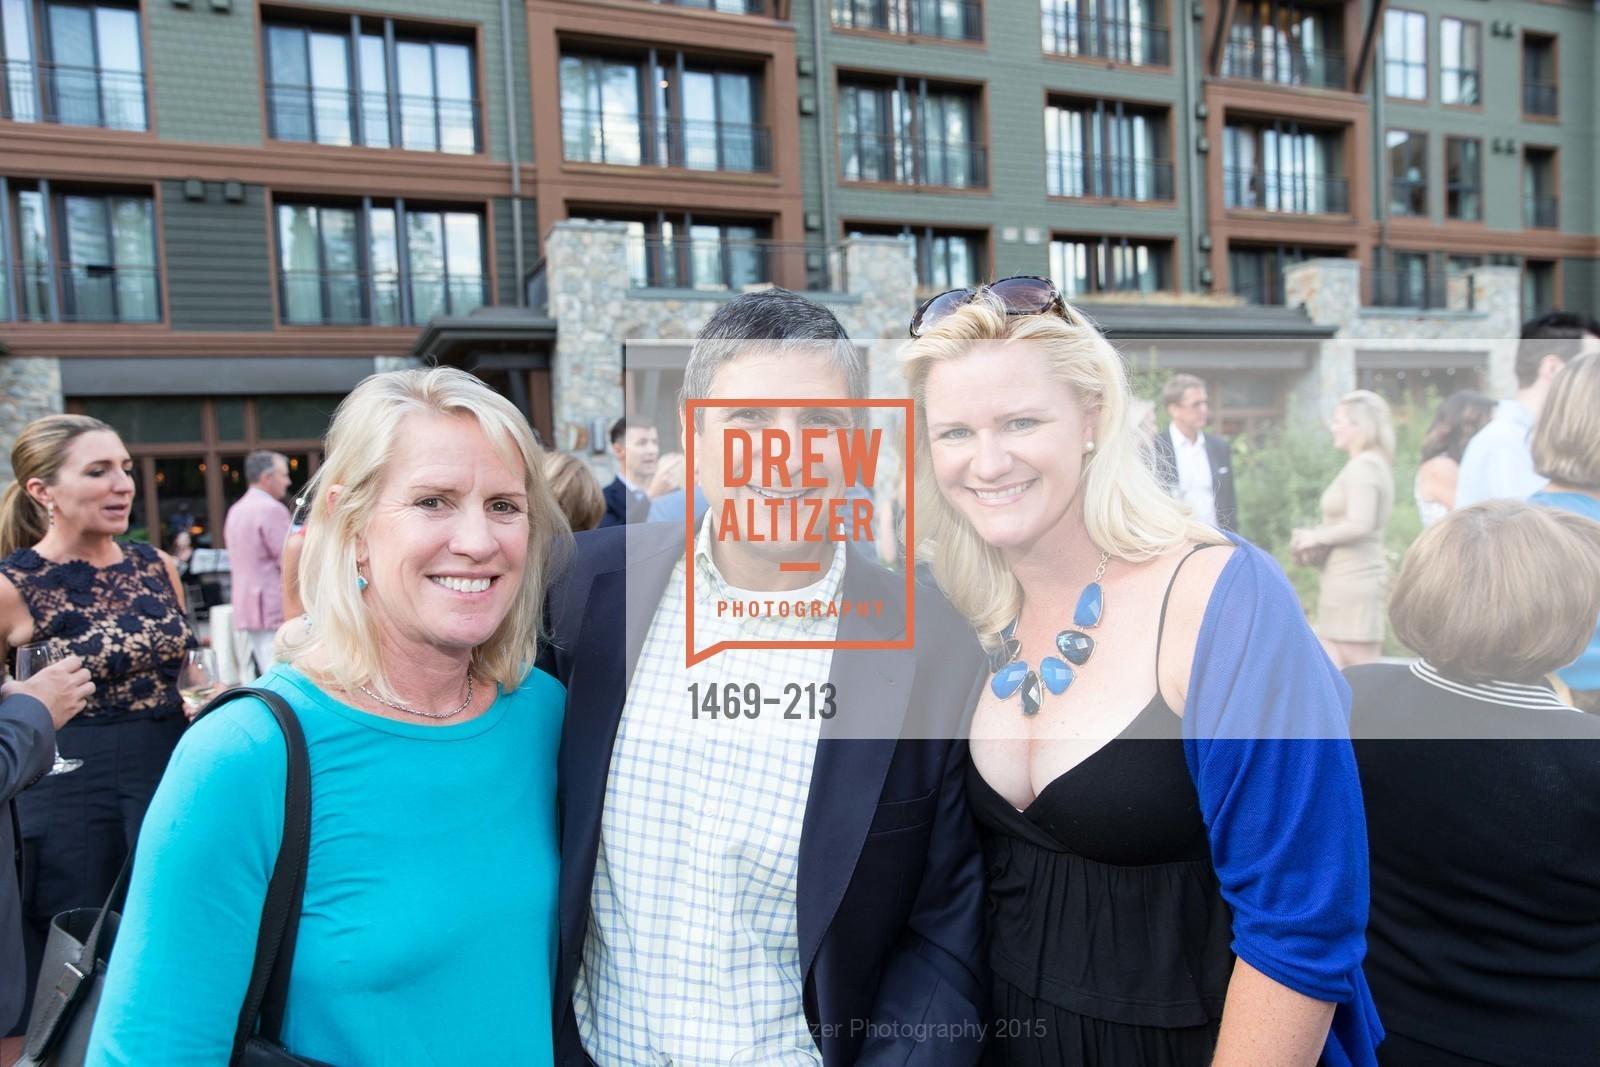 Hilary Davis, Mike Zuckerman, League to Save Lake Tahoe Sponsor Cocktail Party, Ritz-Carlton, Lake Tahoe, July 31st, 2015,Drew Altizer, Drew Altizer Photography, full-service agency, private events, San Francisco photographer, photographer california